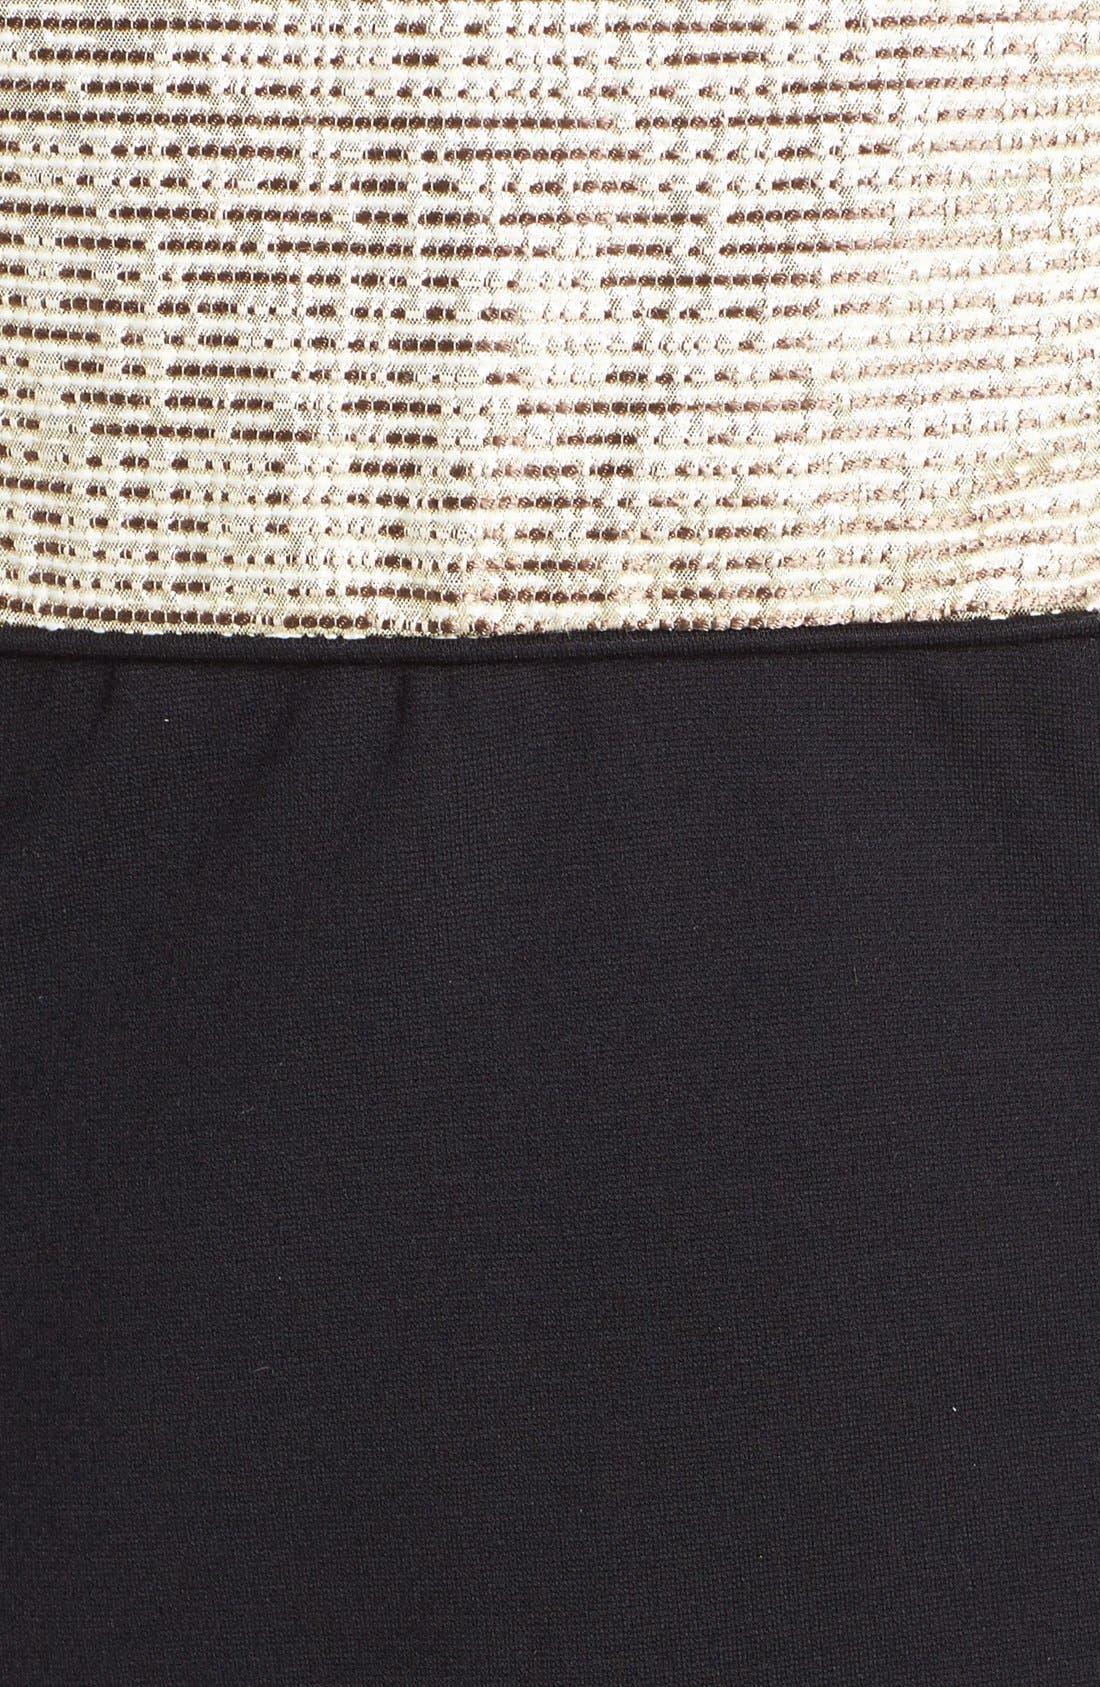 Alternate Image 3  - 4.collective Metallic Panel Knit Sheath Dress